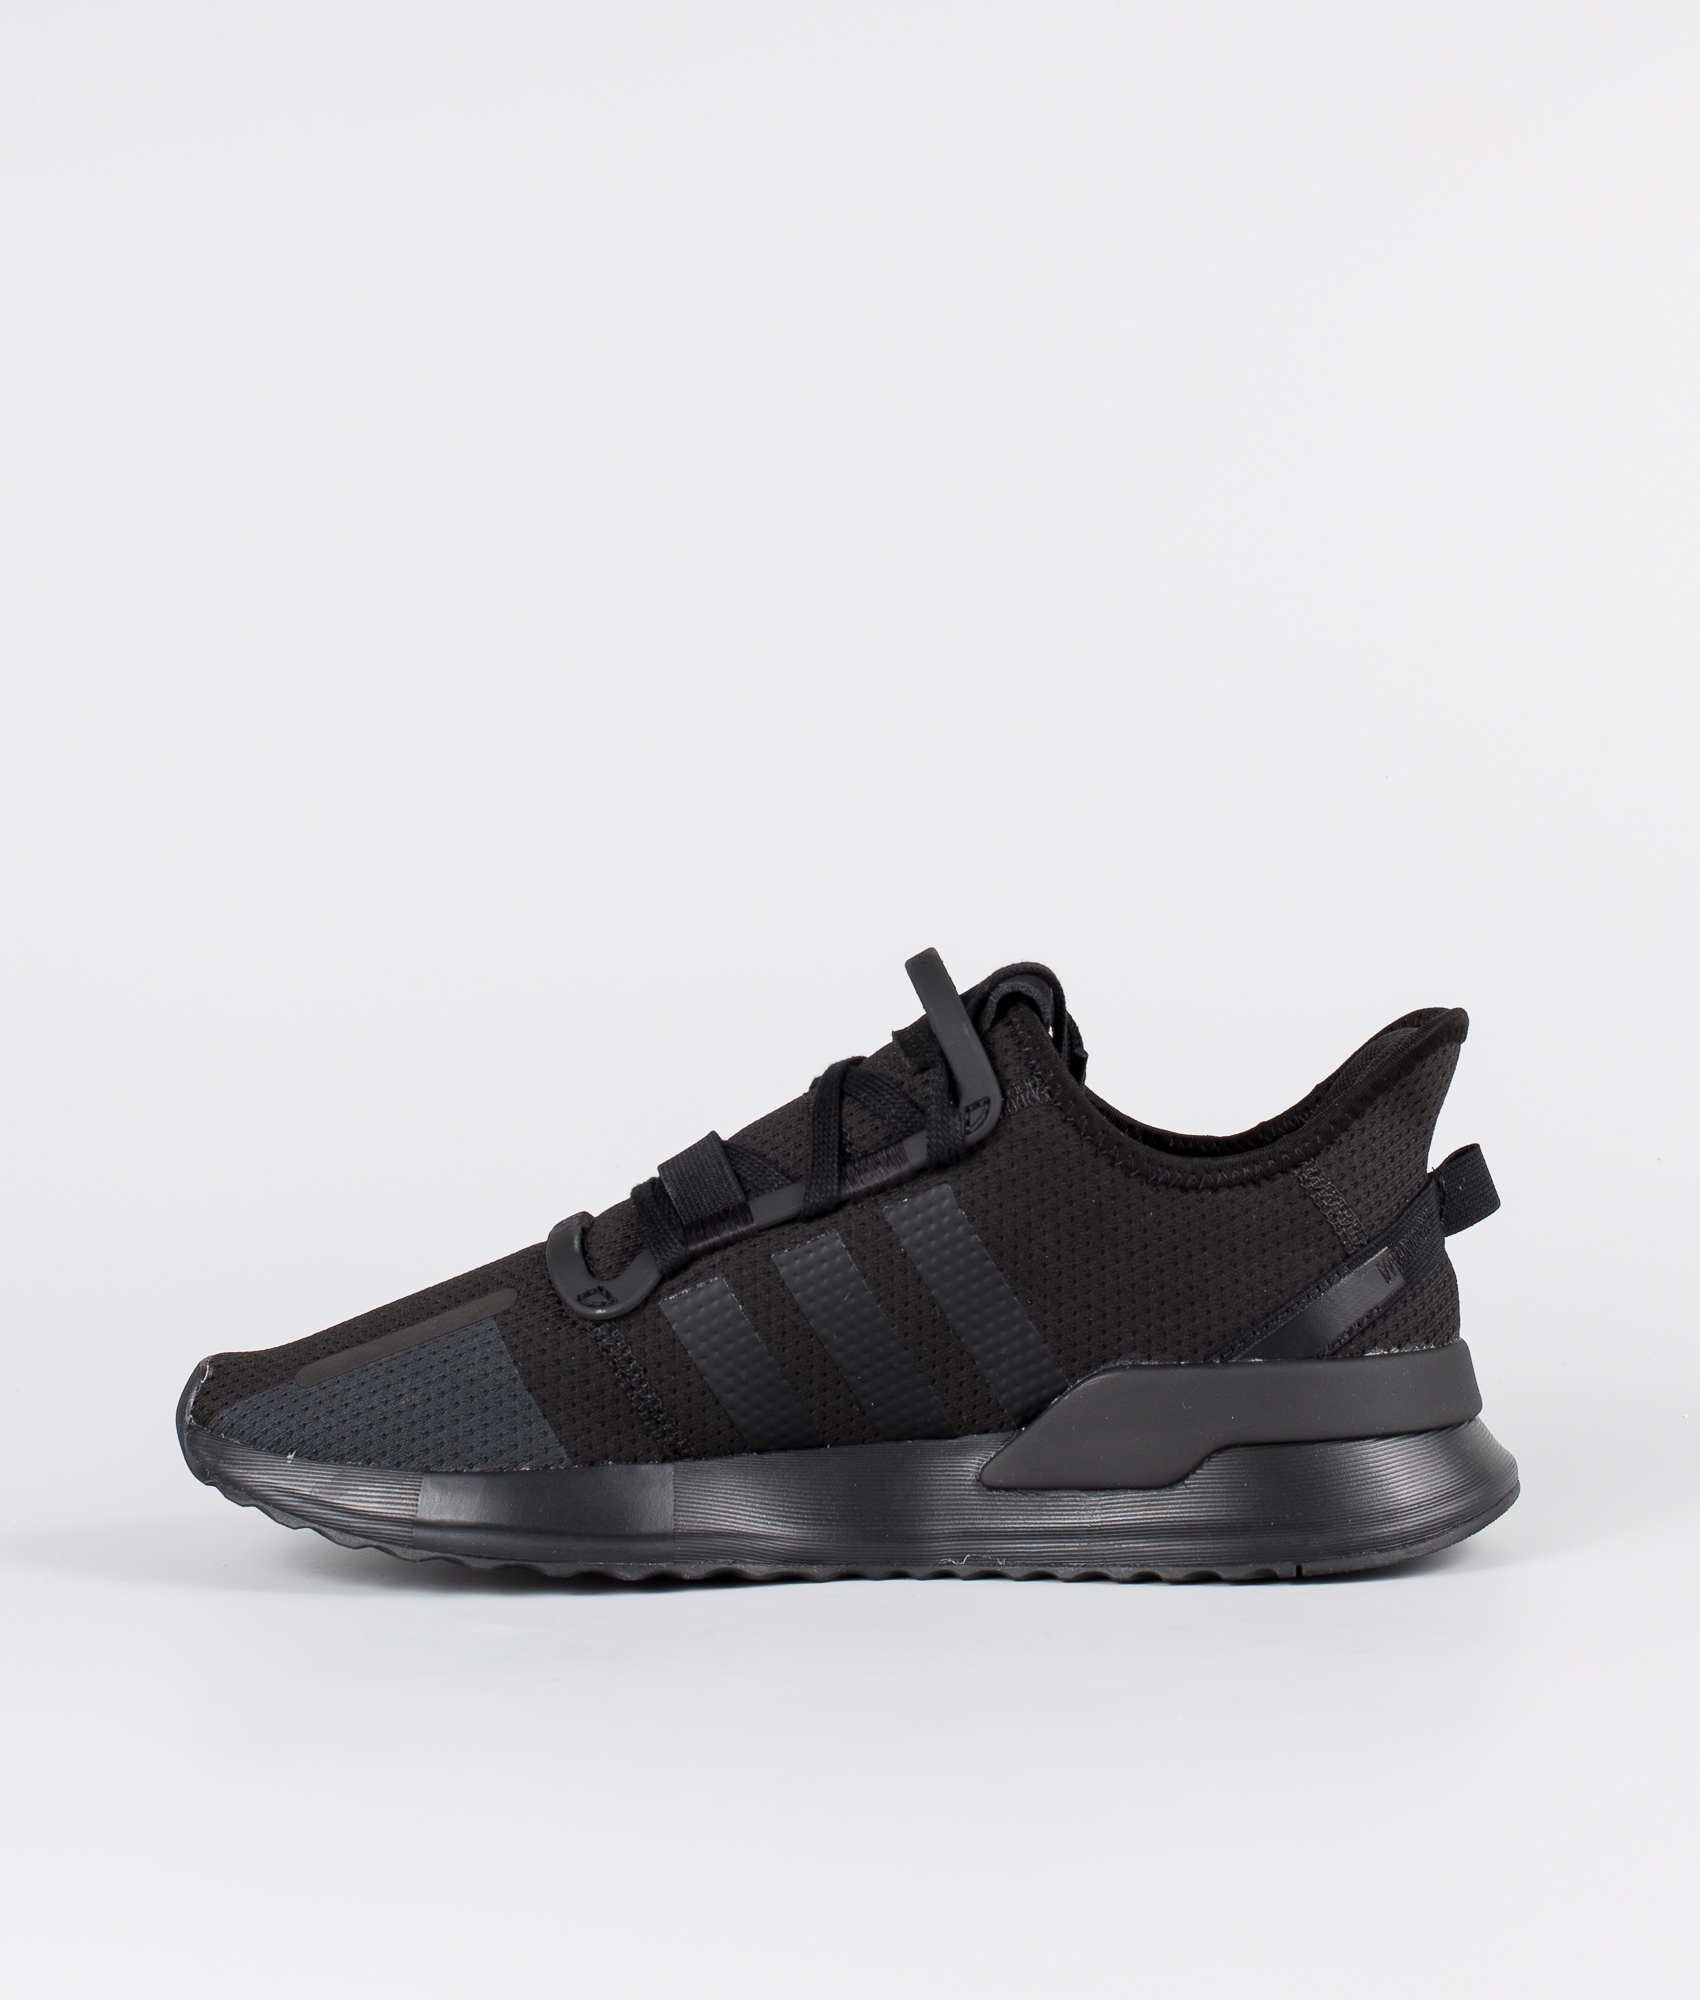 Black U Blackcore Adidas Core Originals Run Schuhe path nO0wkXN8P